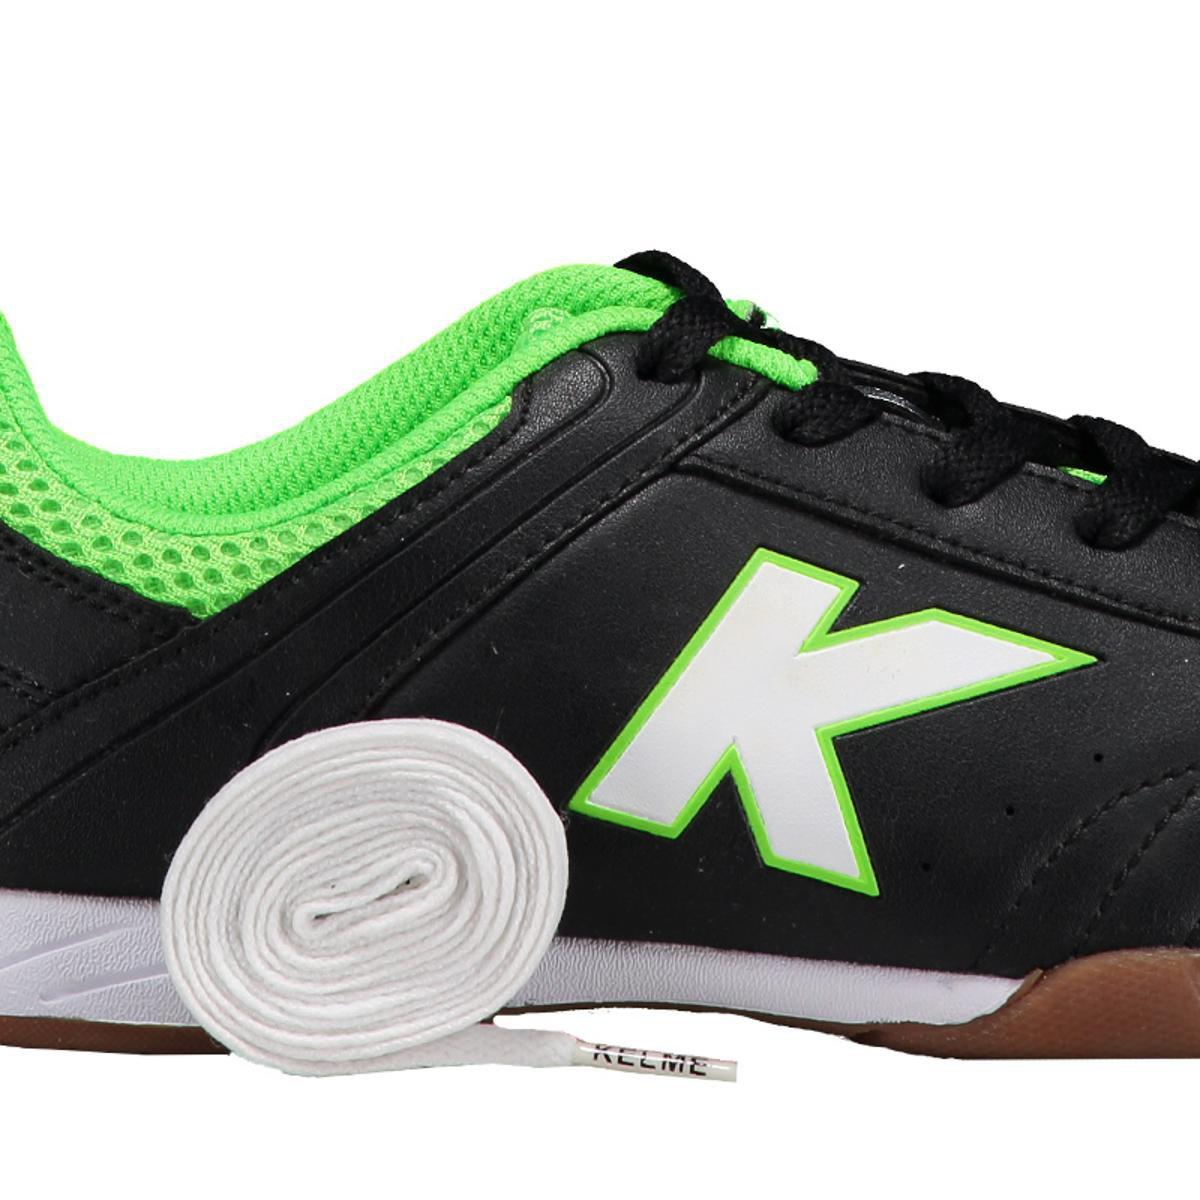 b0abc28fabc Chuteira Kelme Precision Trn Futsal - Preto - Compre Agora